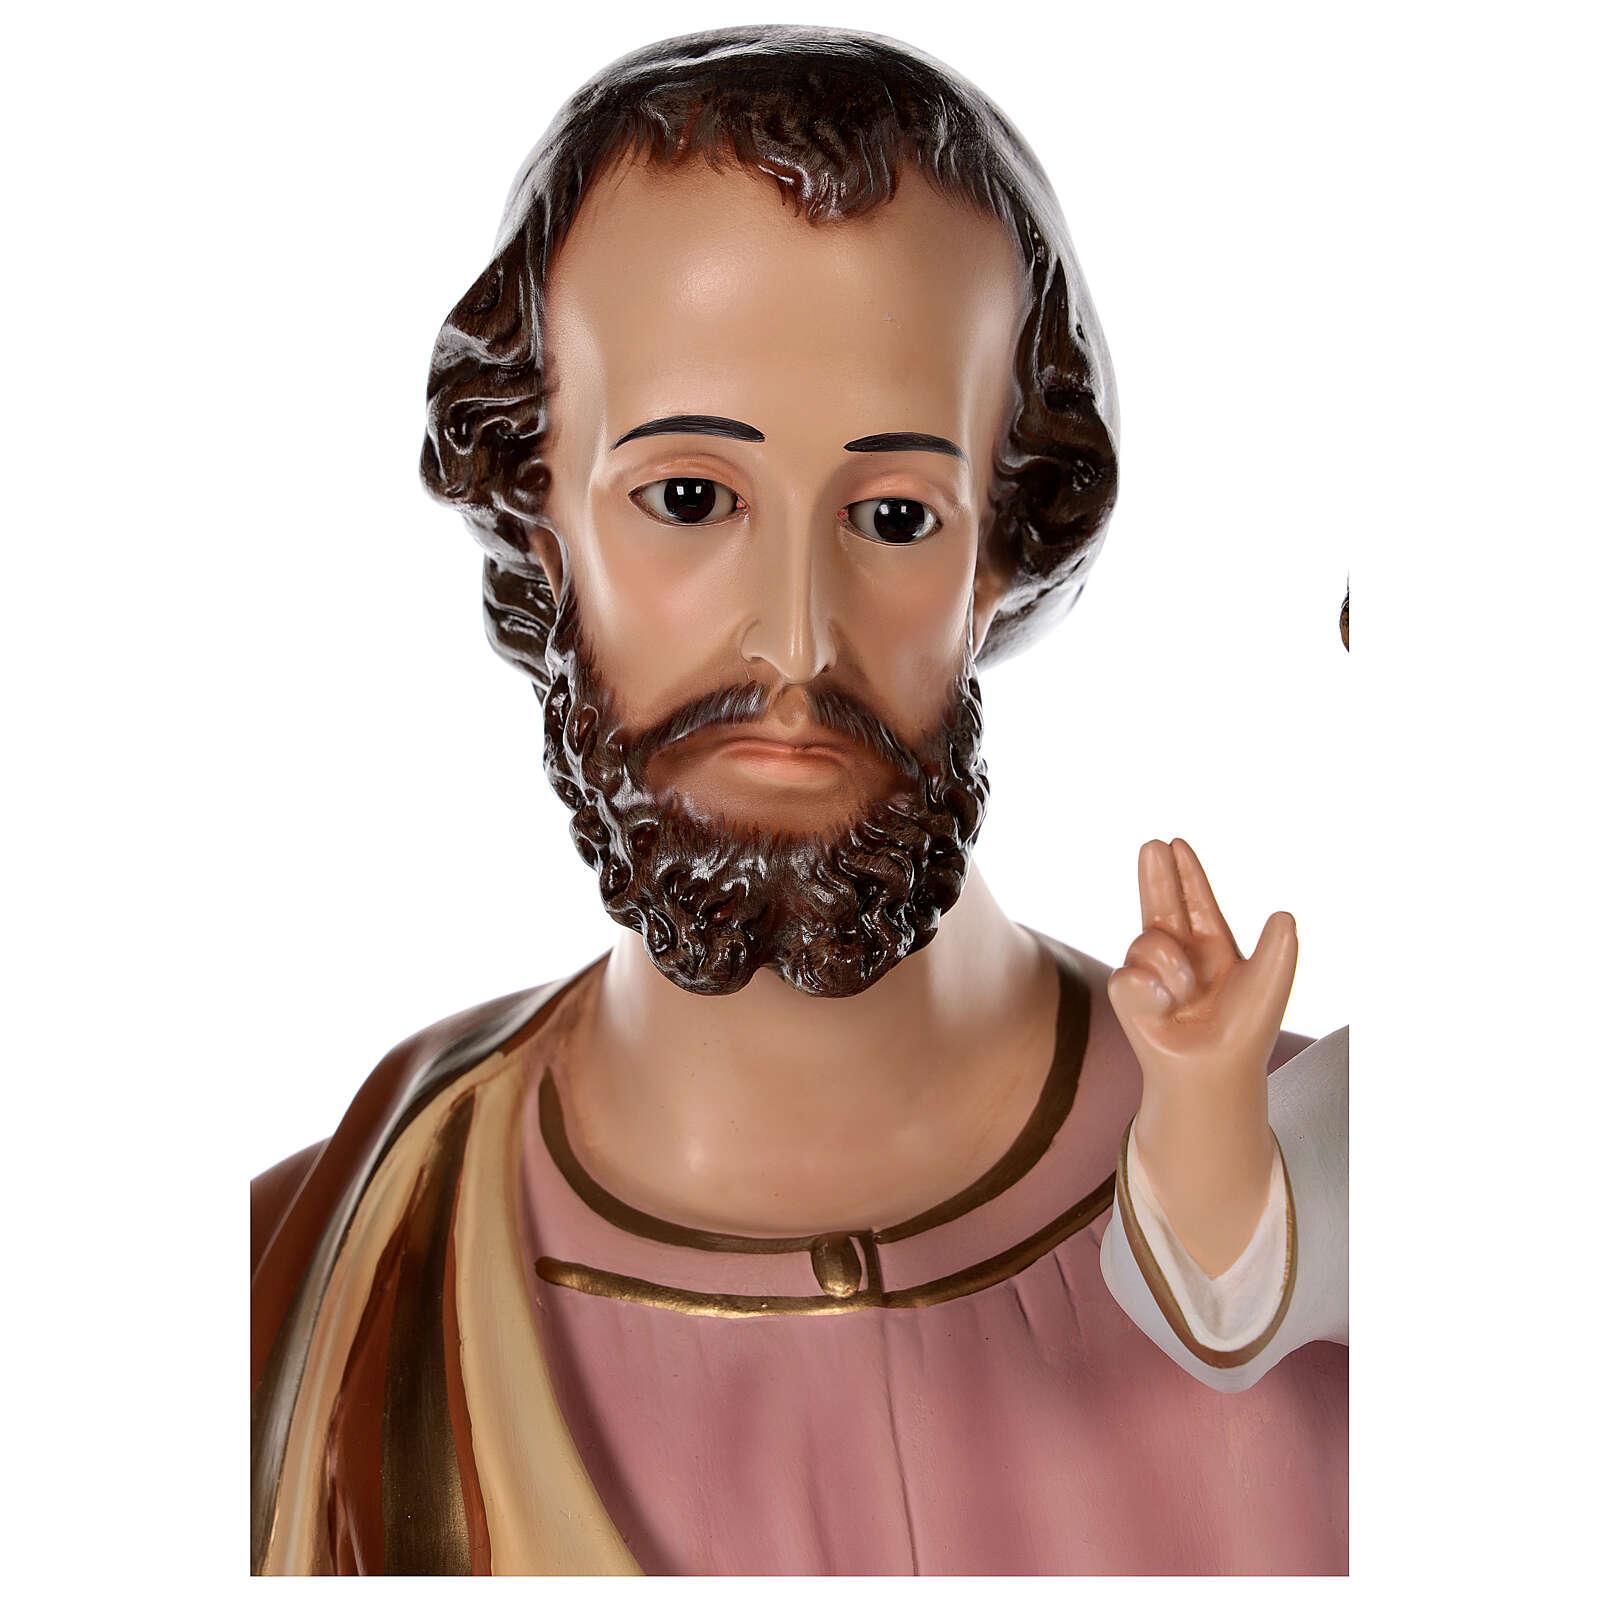 Statua San Giuseppe vetroresina colorata 100 cm occhi vetro 4